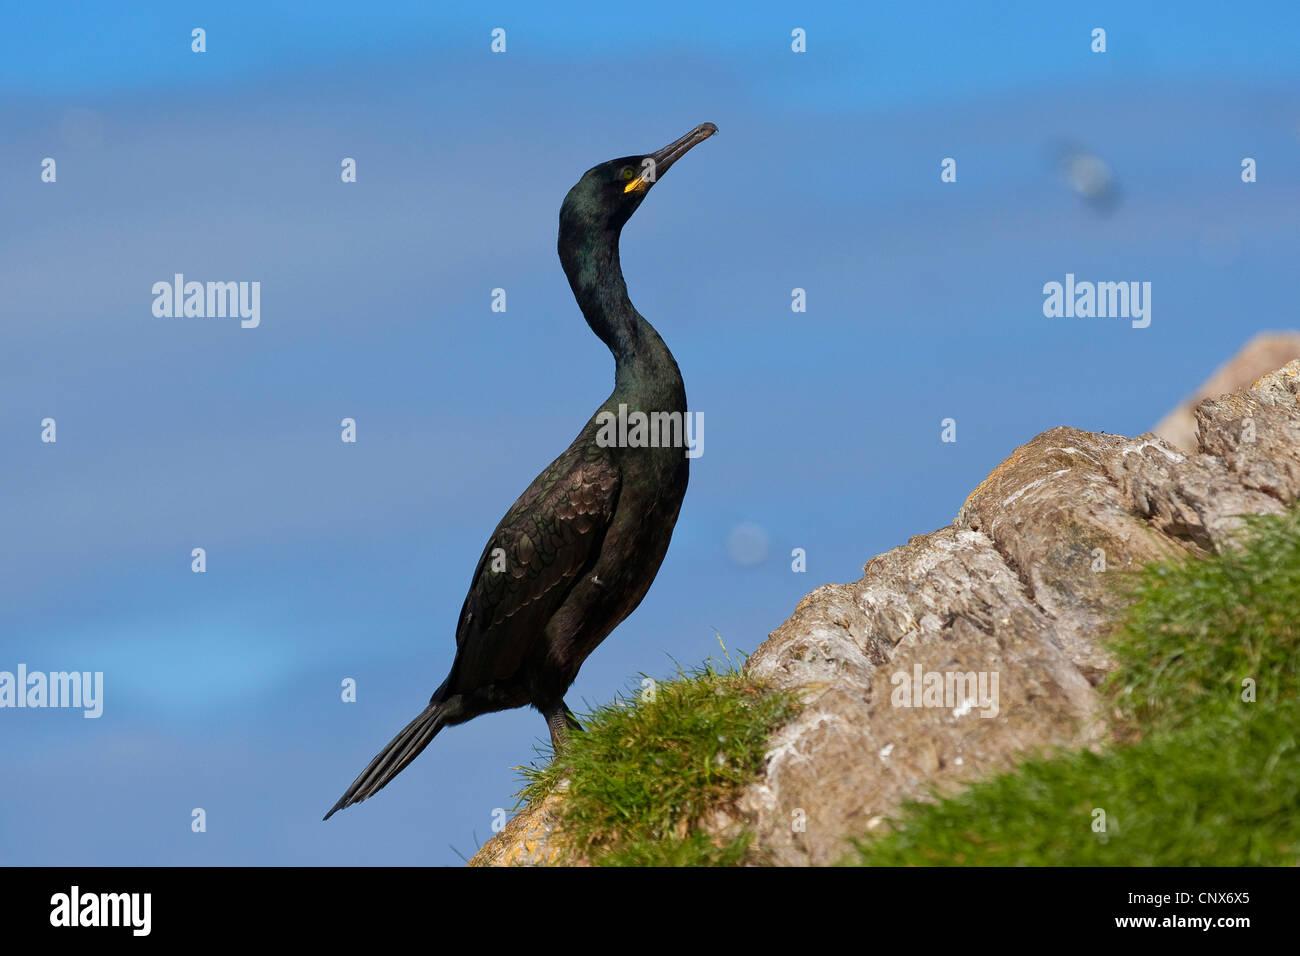 shag (Phalacrocorax aristotelis), sitting on a coastal rock, Germany - Stock Image